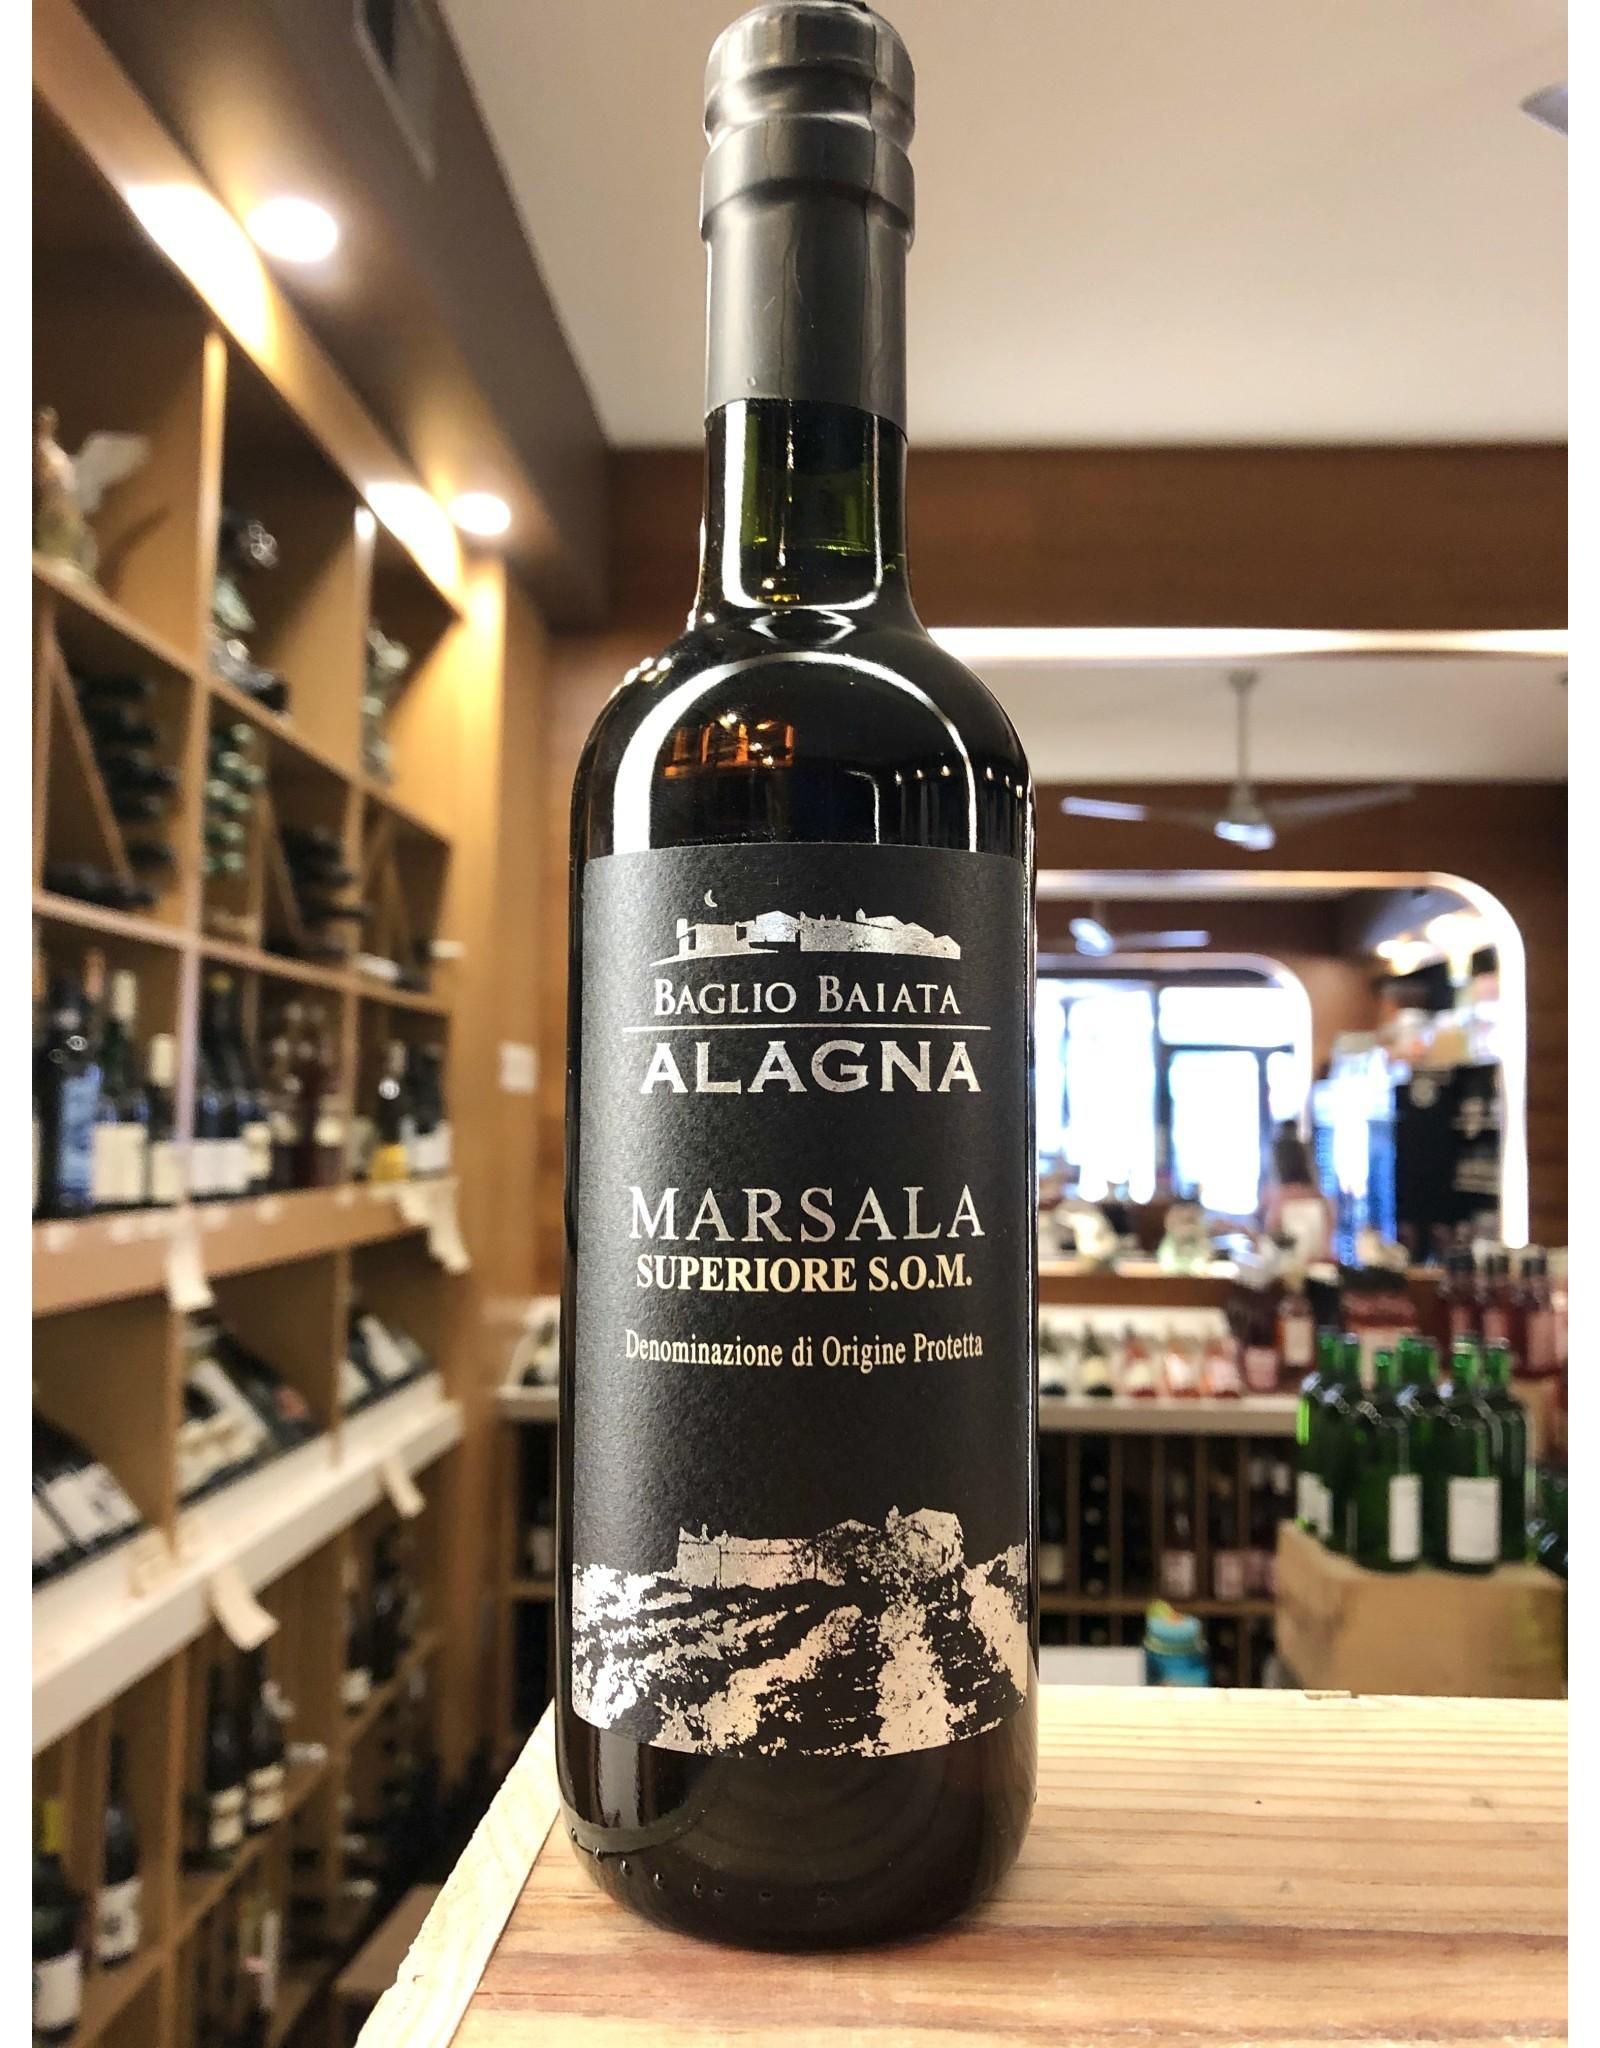 Baglio Baiata Alagna Marsala - 375 ML